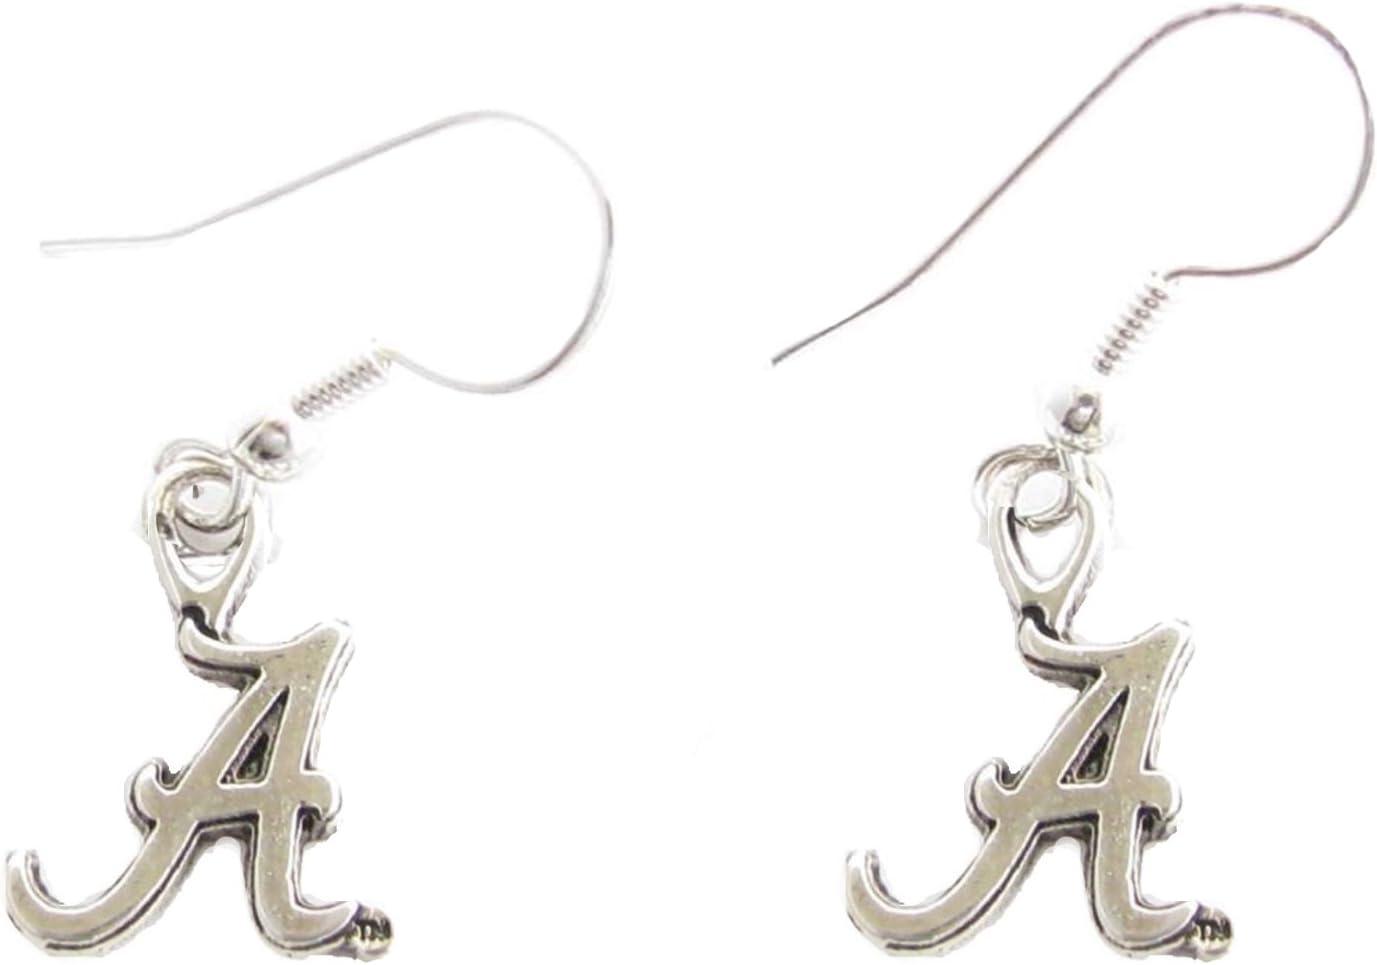 B00C4AM6F6 Sports Accessory Store Alabama Crimson Tide UA Silver Fashion French Hook Earrings 610McK3NFPL